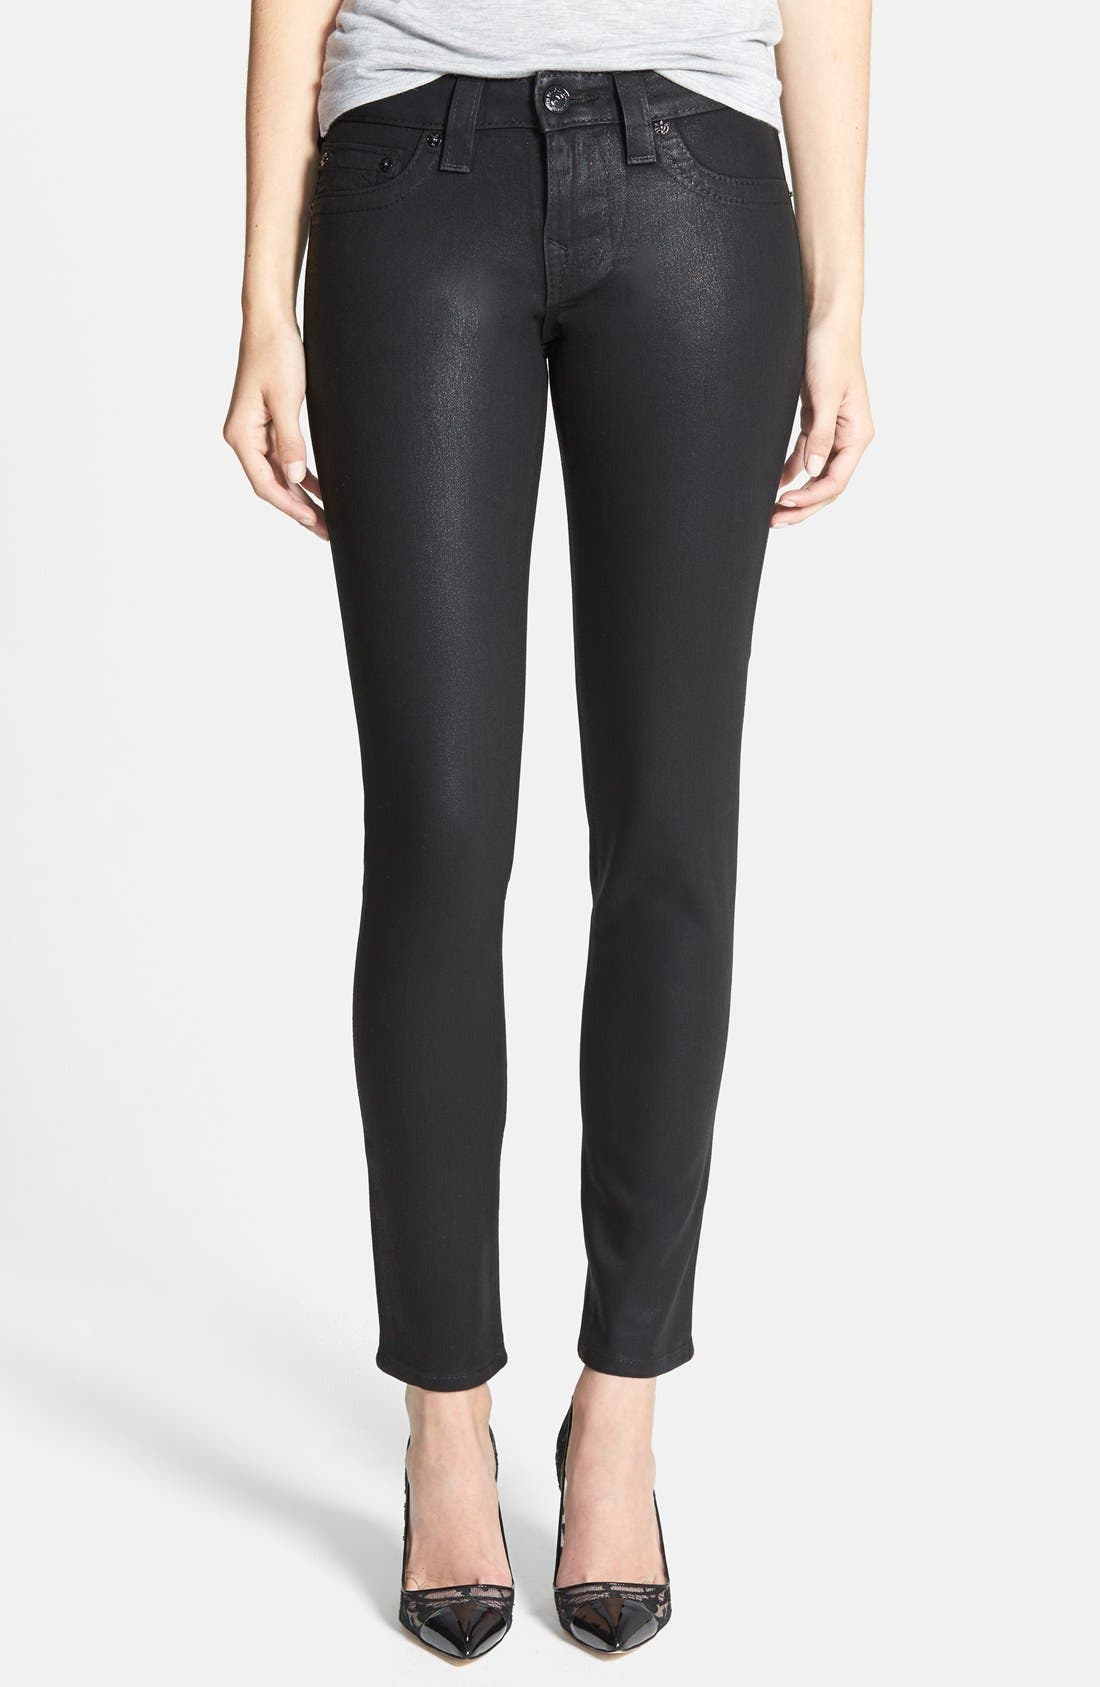 Main Image - True Religion Brand Jeans 'Halle - Super Vixen' Coated Skinny Jeans (Black)